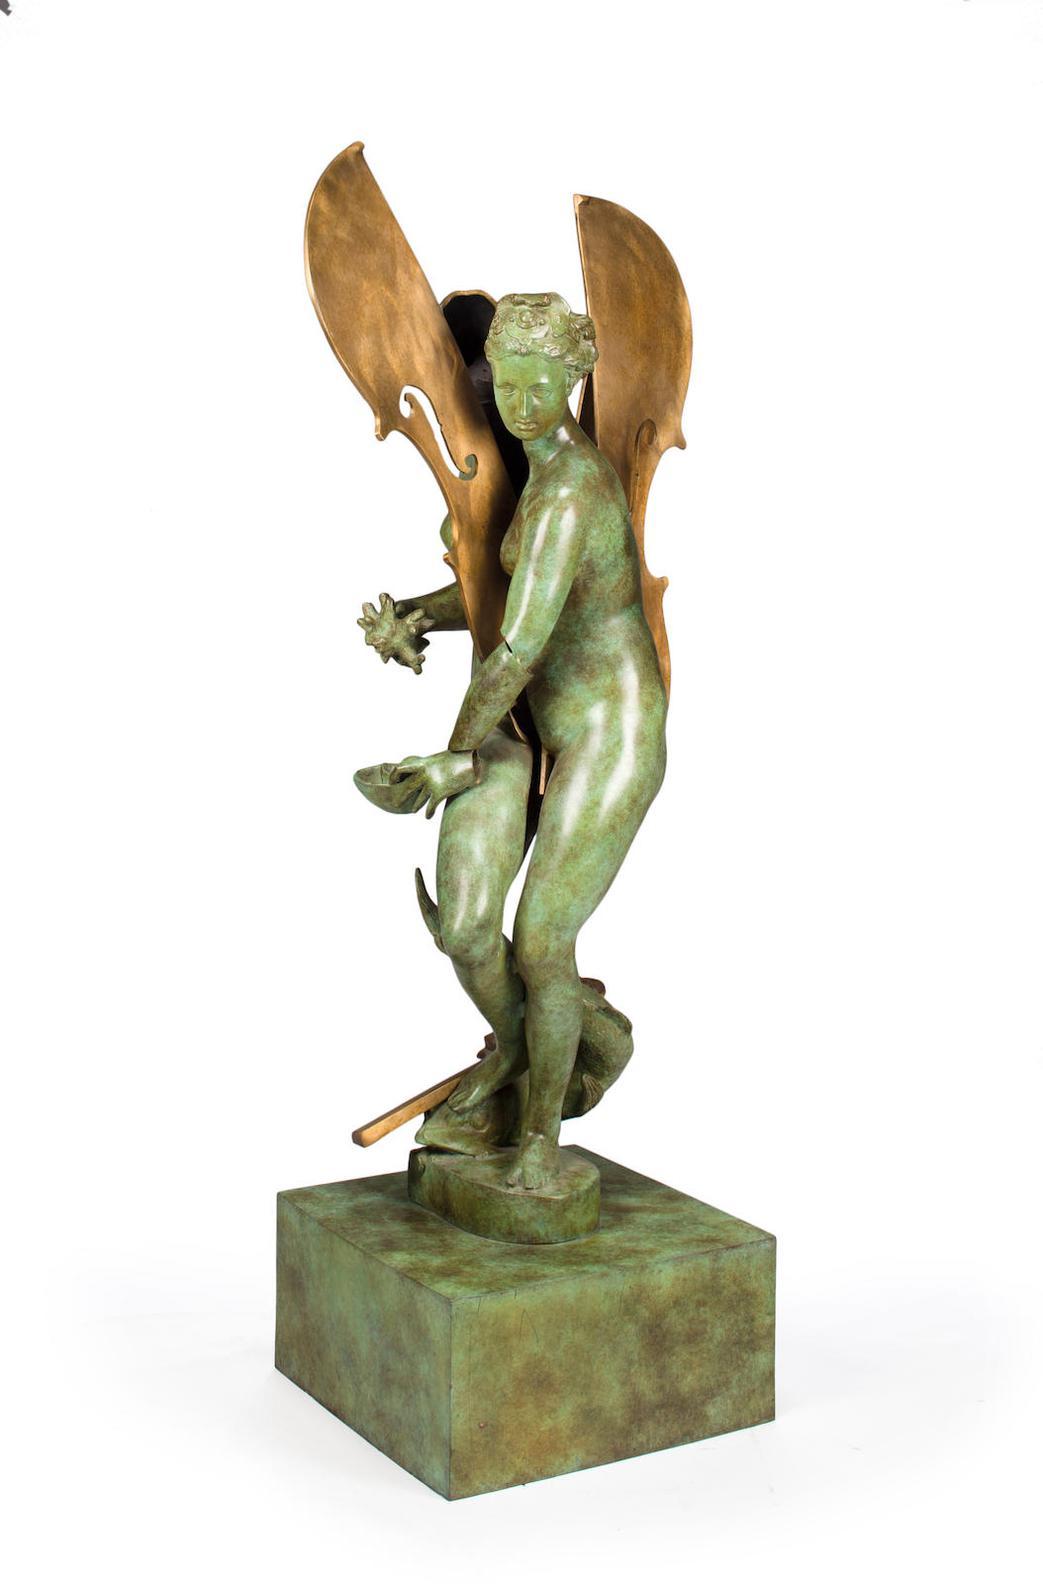 Arman-Untitled-2004